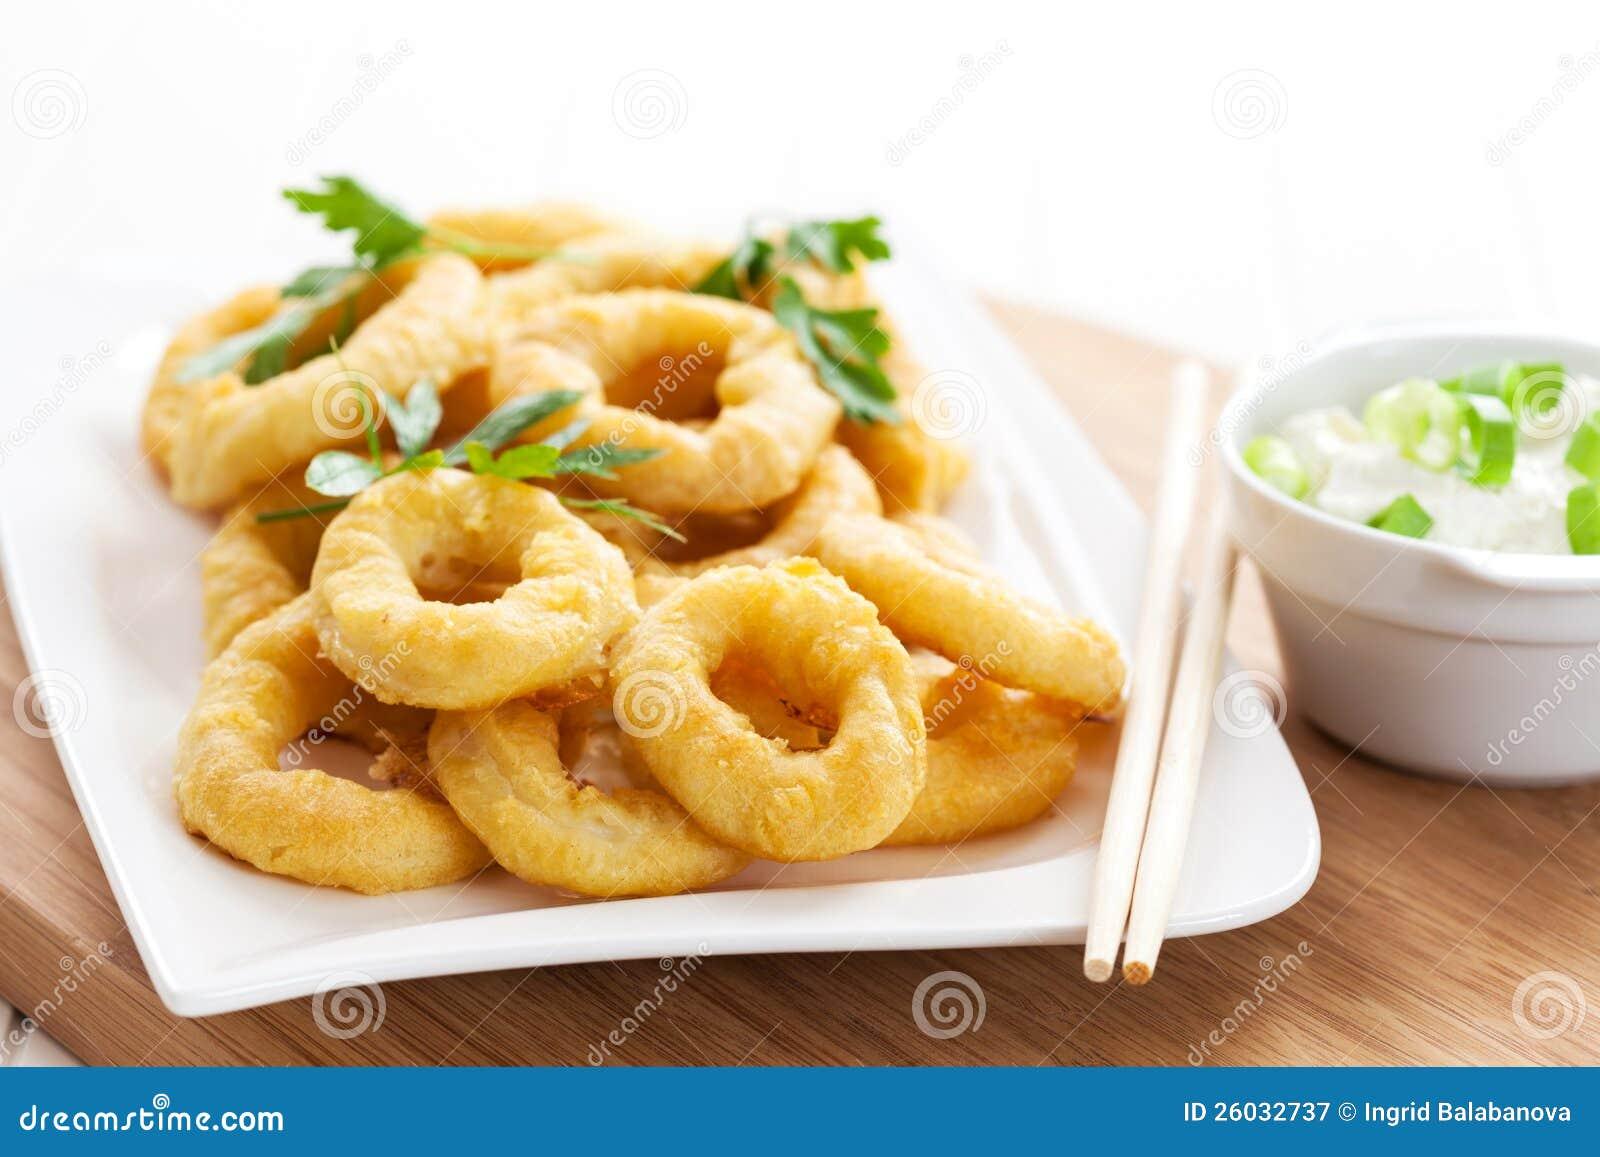 Fried Calamari Rings Royalty Free Stock Photography - Image: 26032737